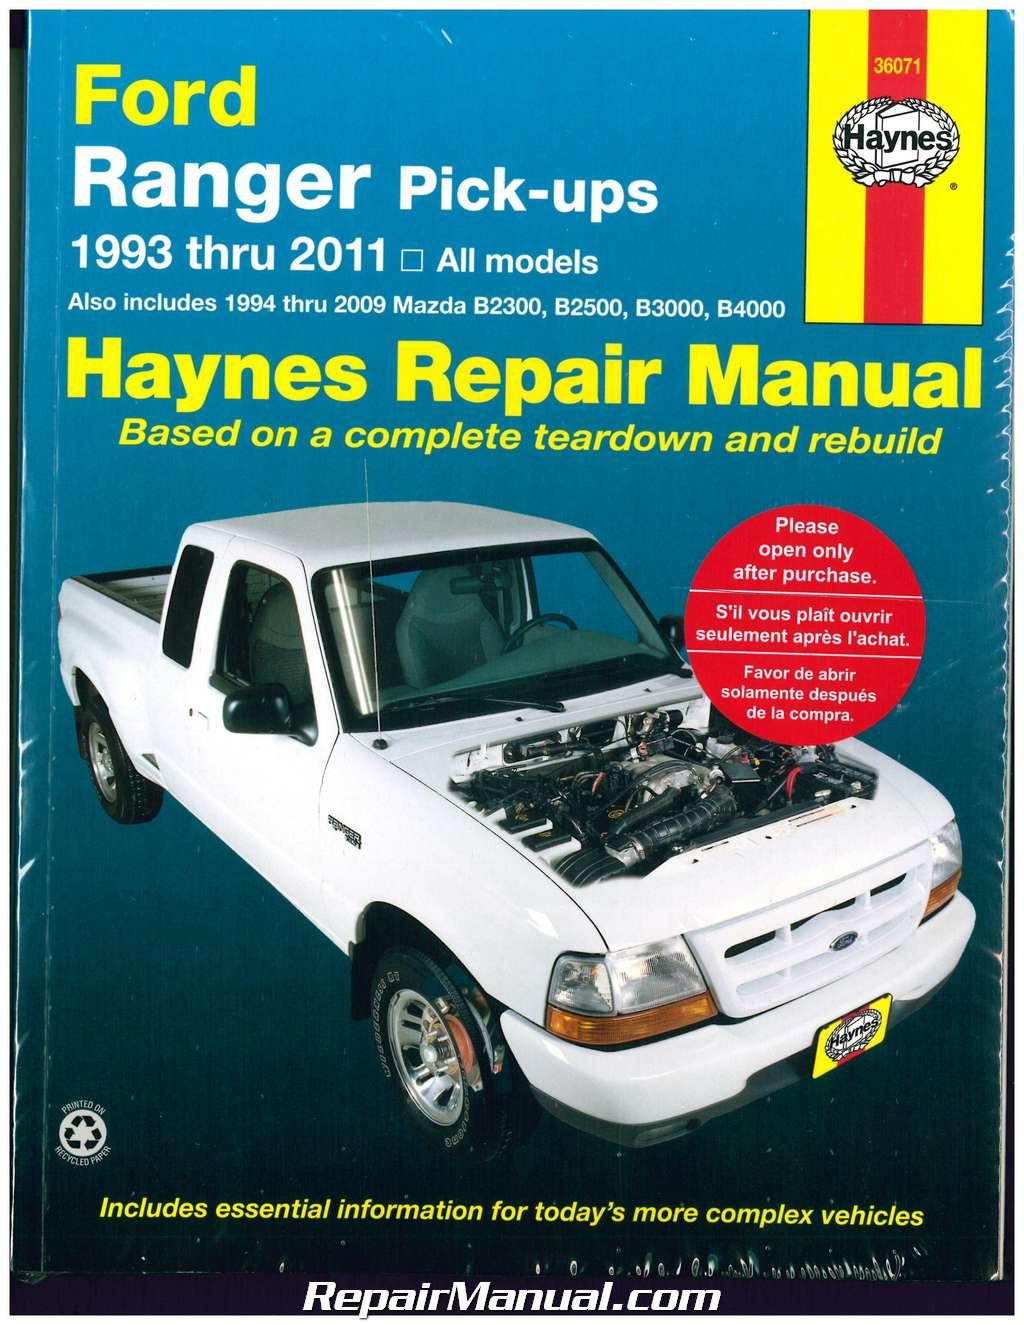 Haynes Ford Ranger Pickups 1993